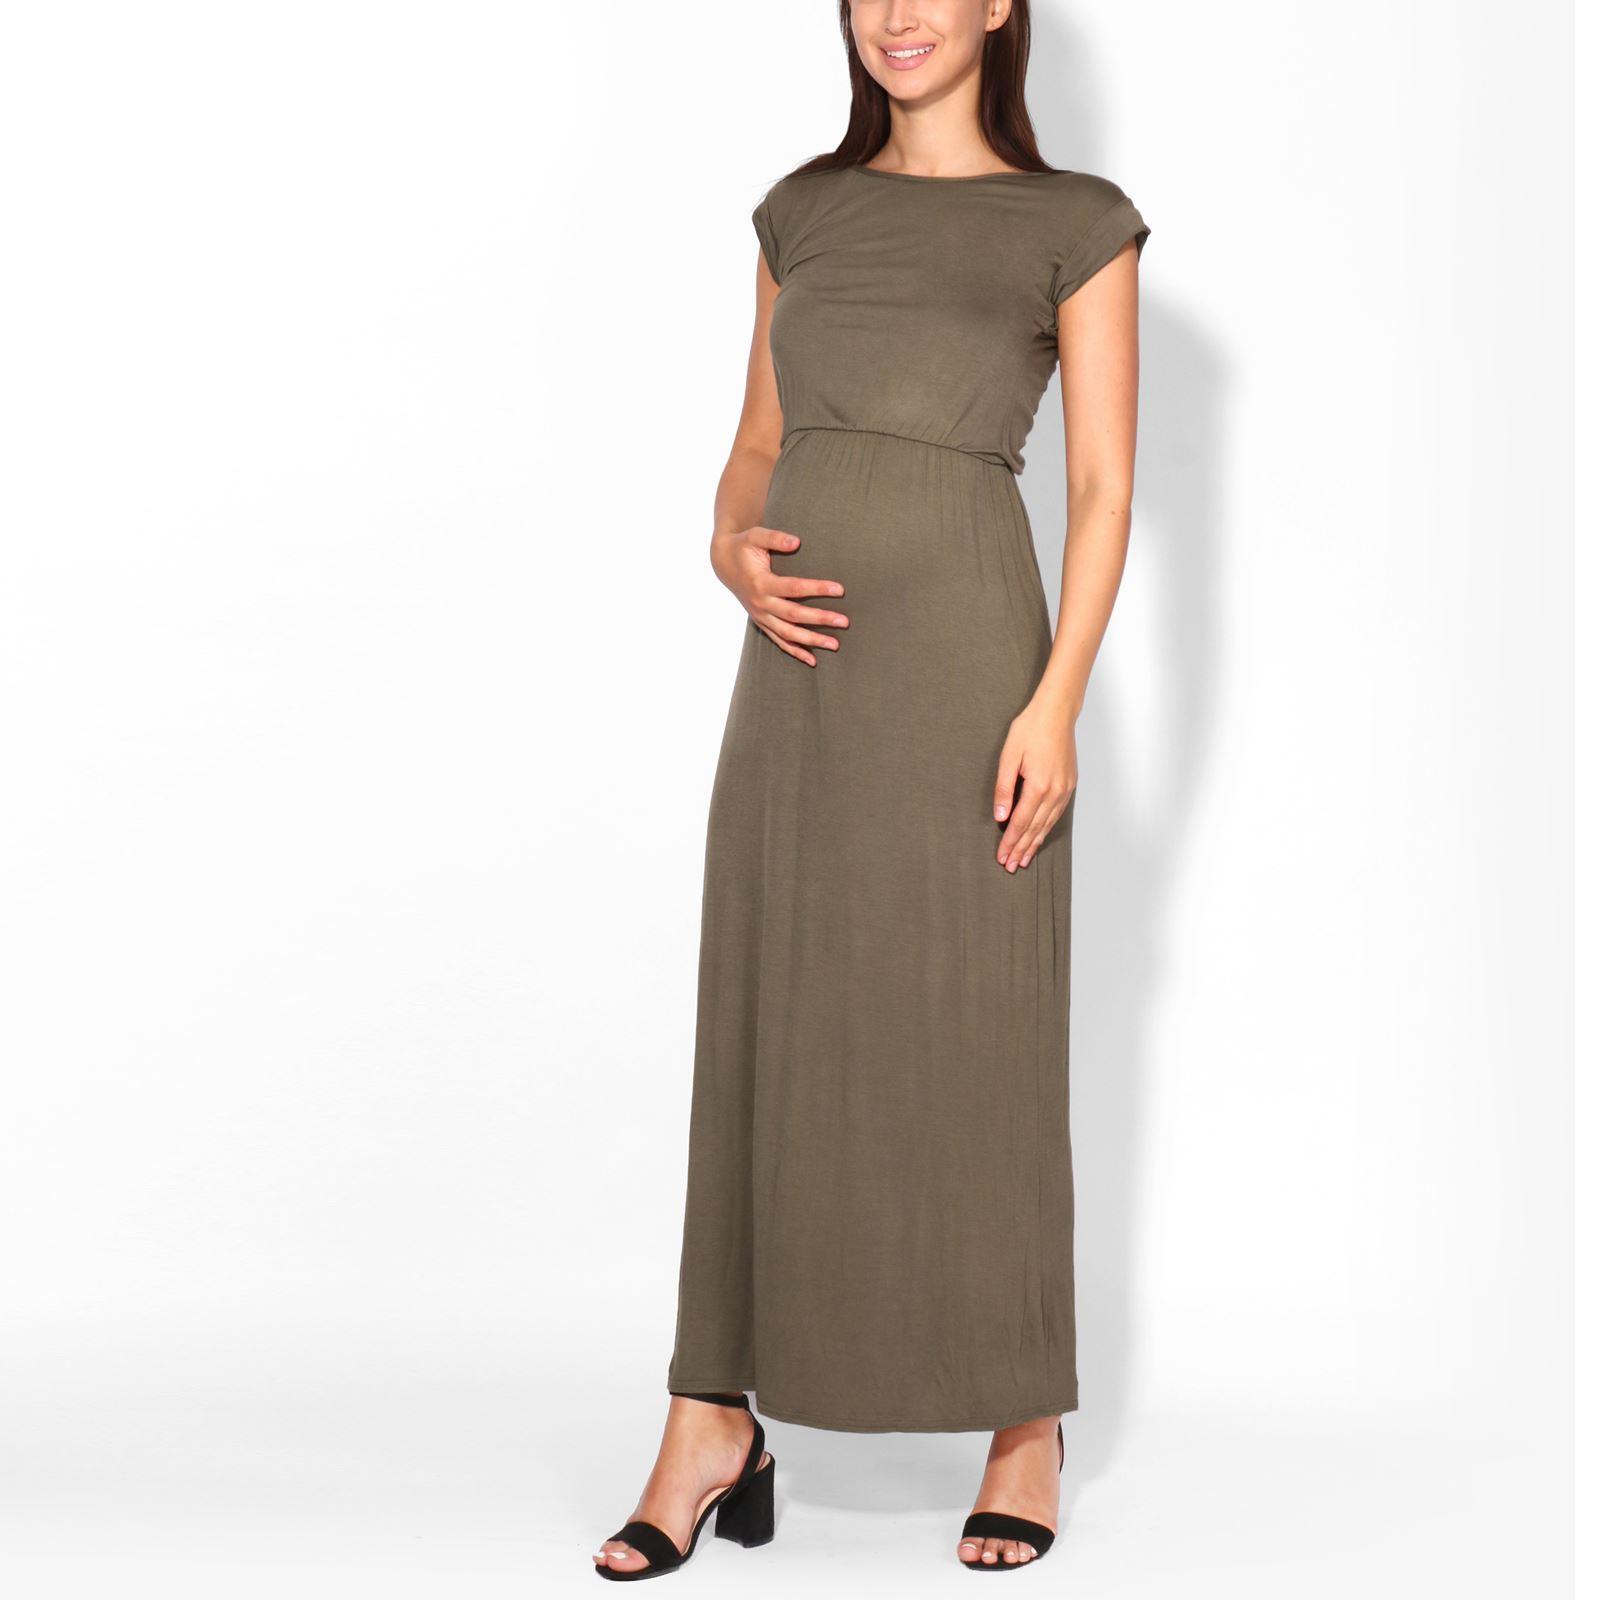 3170528b05d1 Krisp Ladies Oversized Short Sleeve Long Loose Stretch Maxi Jersey ...